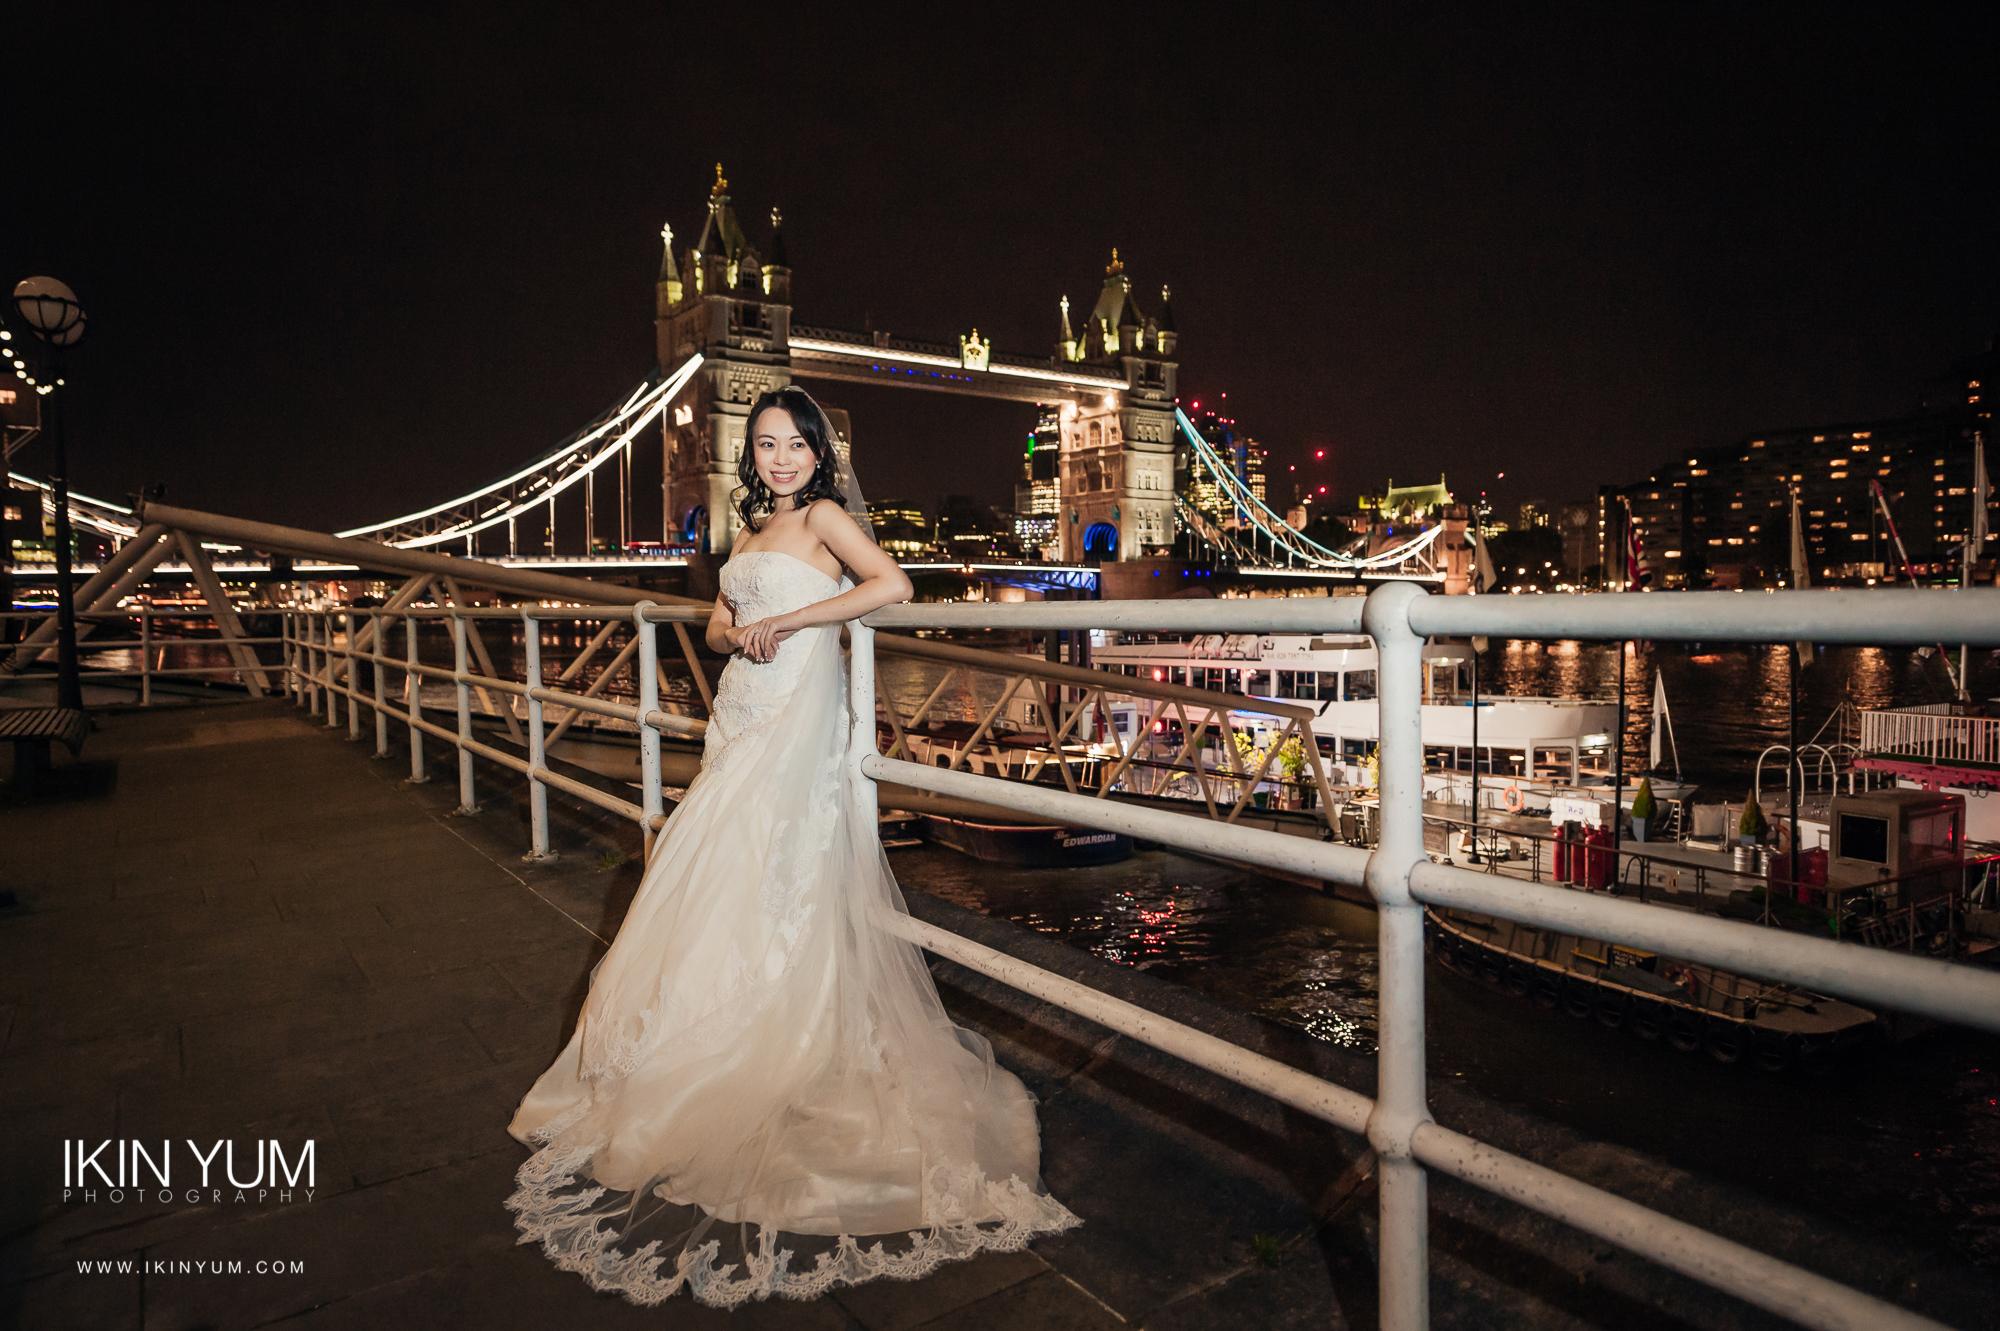 Chloe & Carlos Pre-Wedding Shoot- Ikin Yum Photography-0165.jpg